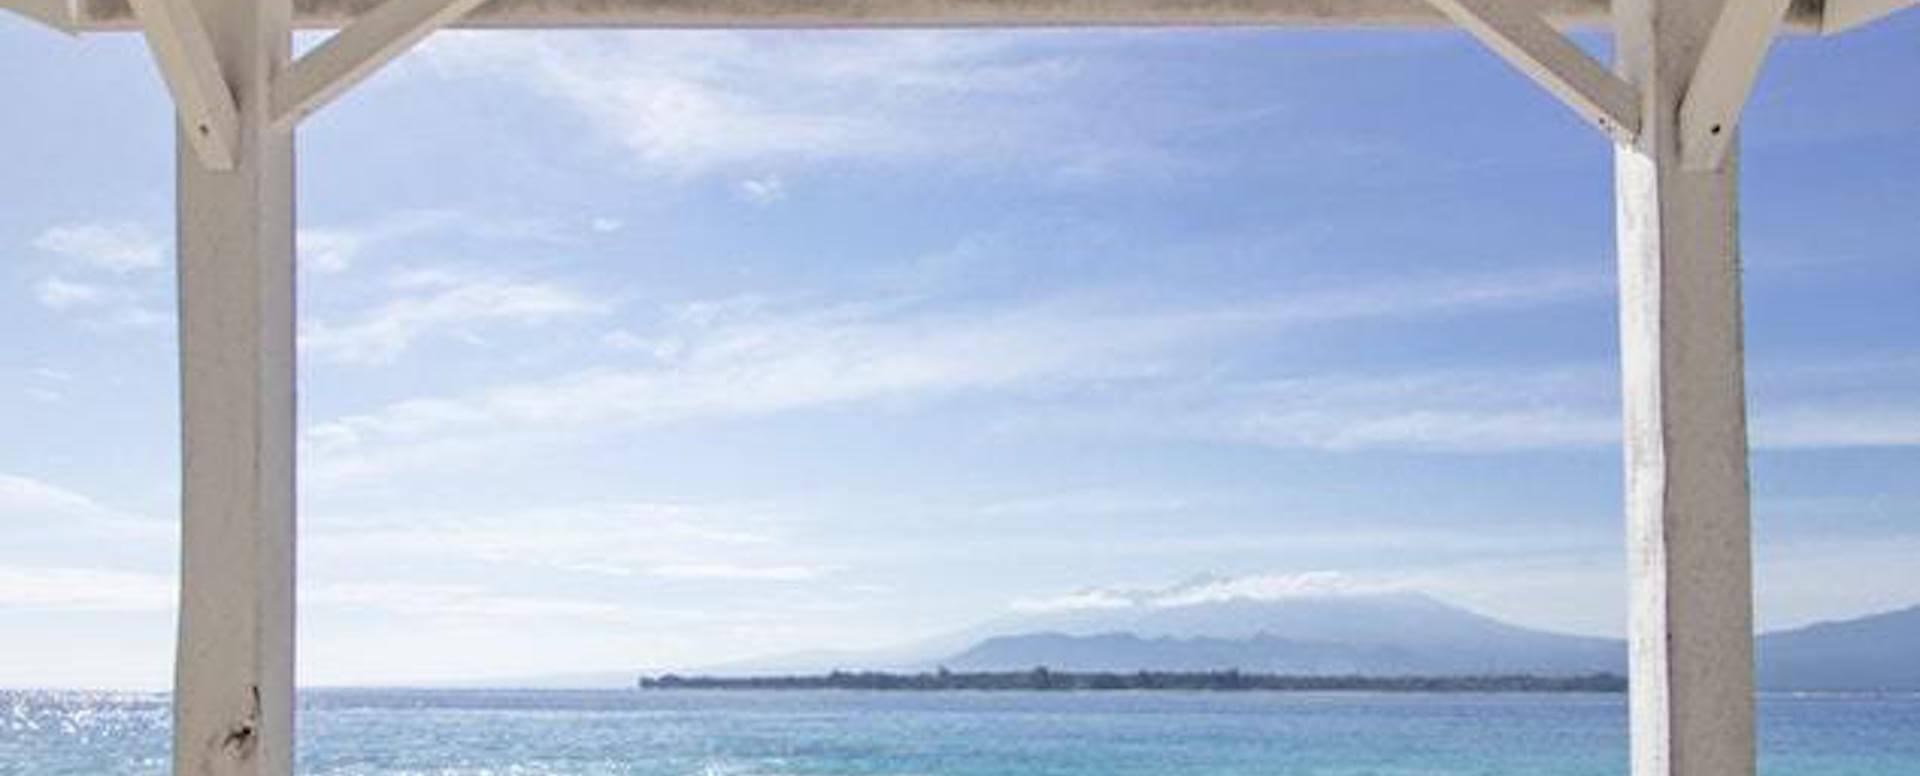 Les îles Gili - Indonésie